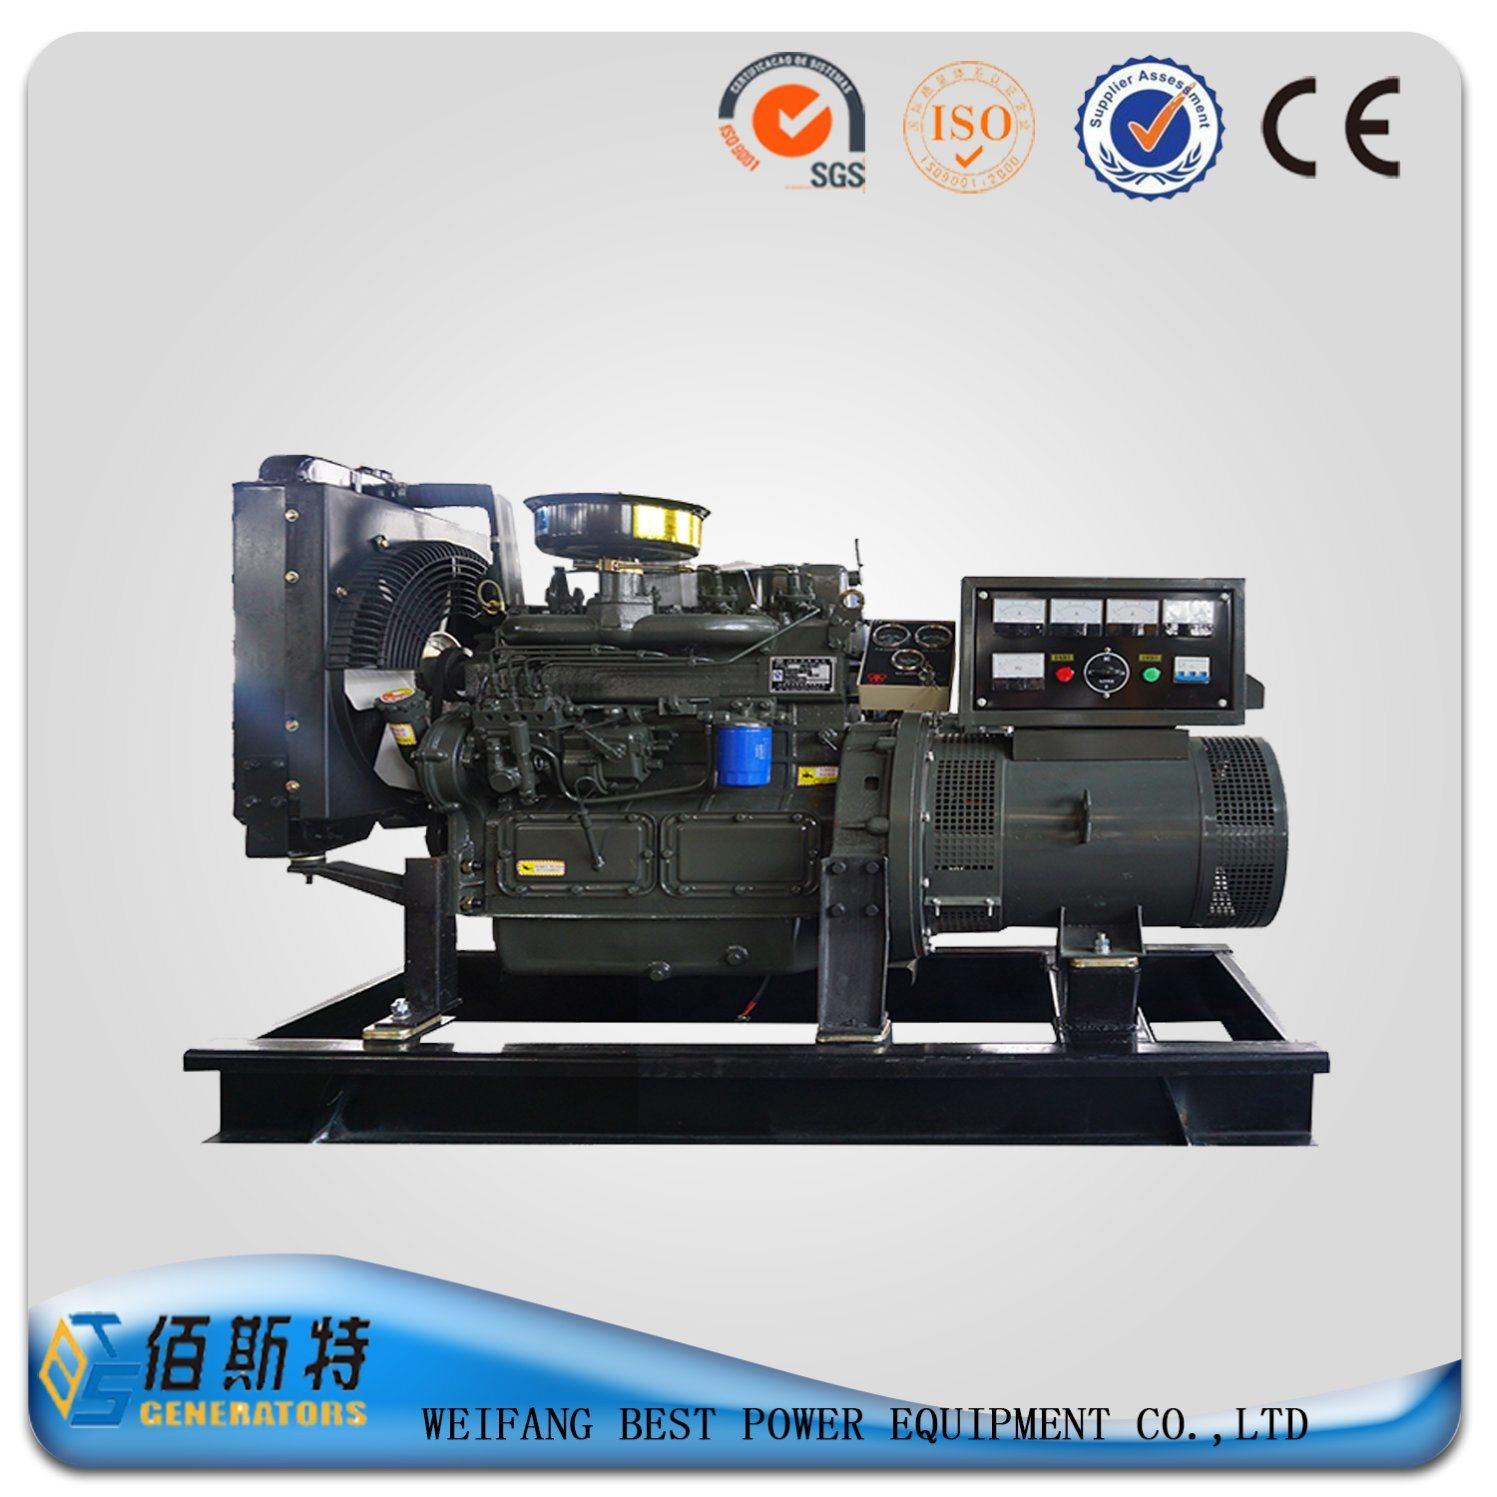 China 40kw Diesel Generator Set Price Best Quality Generator Set